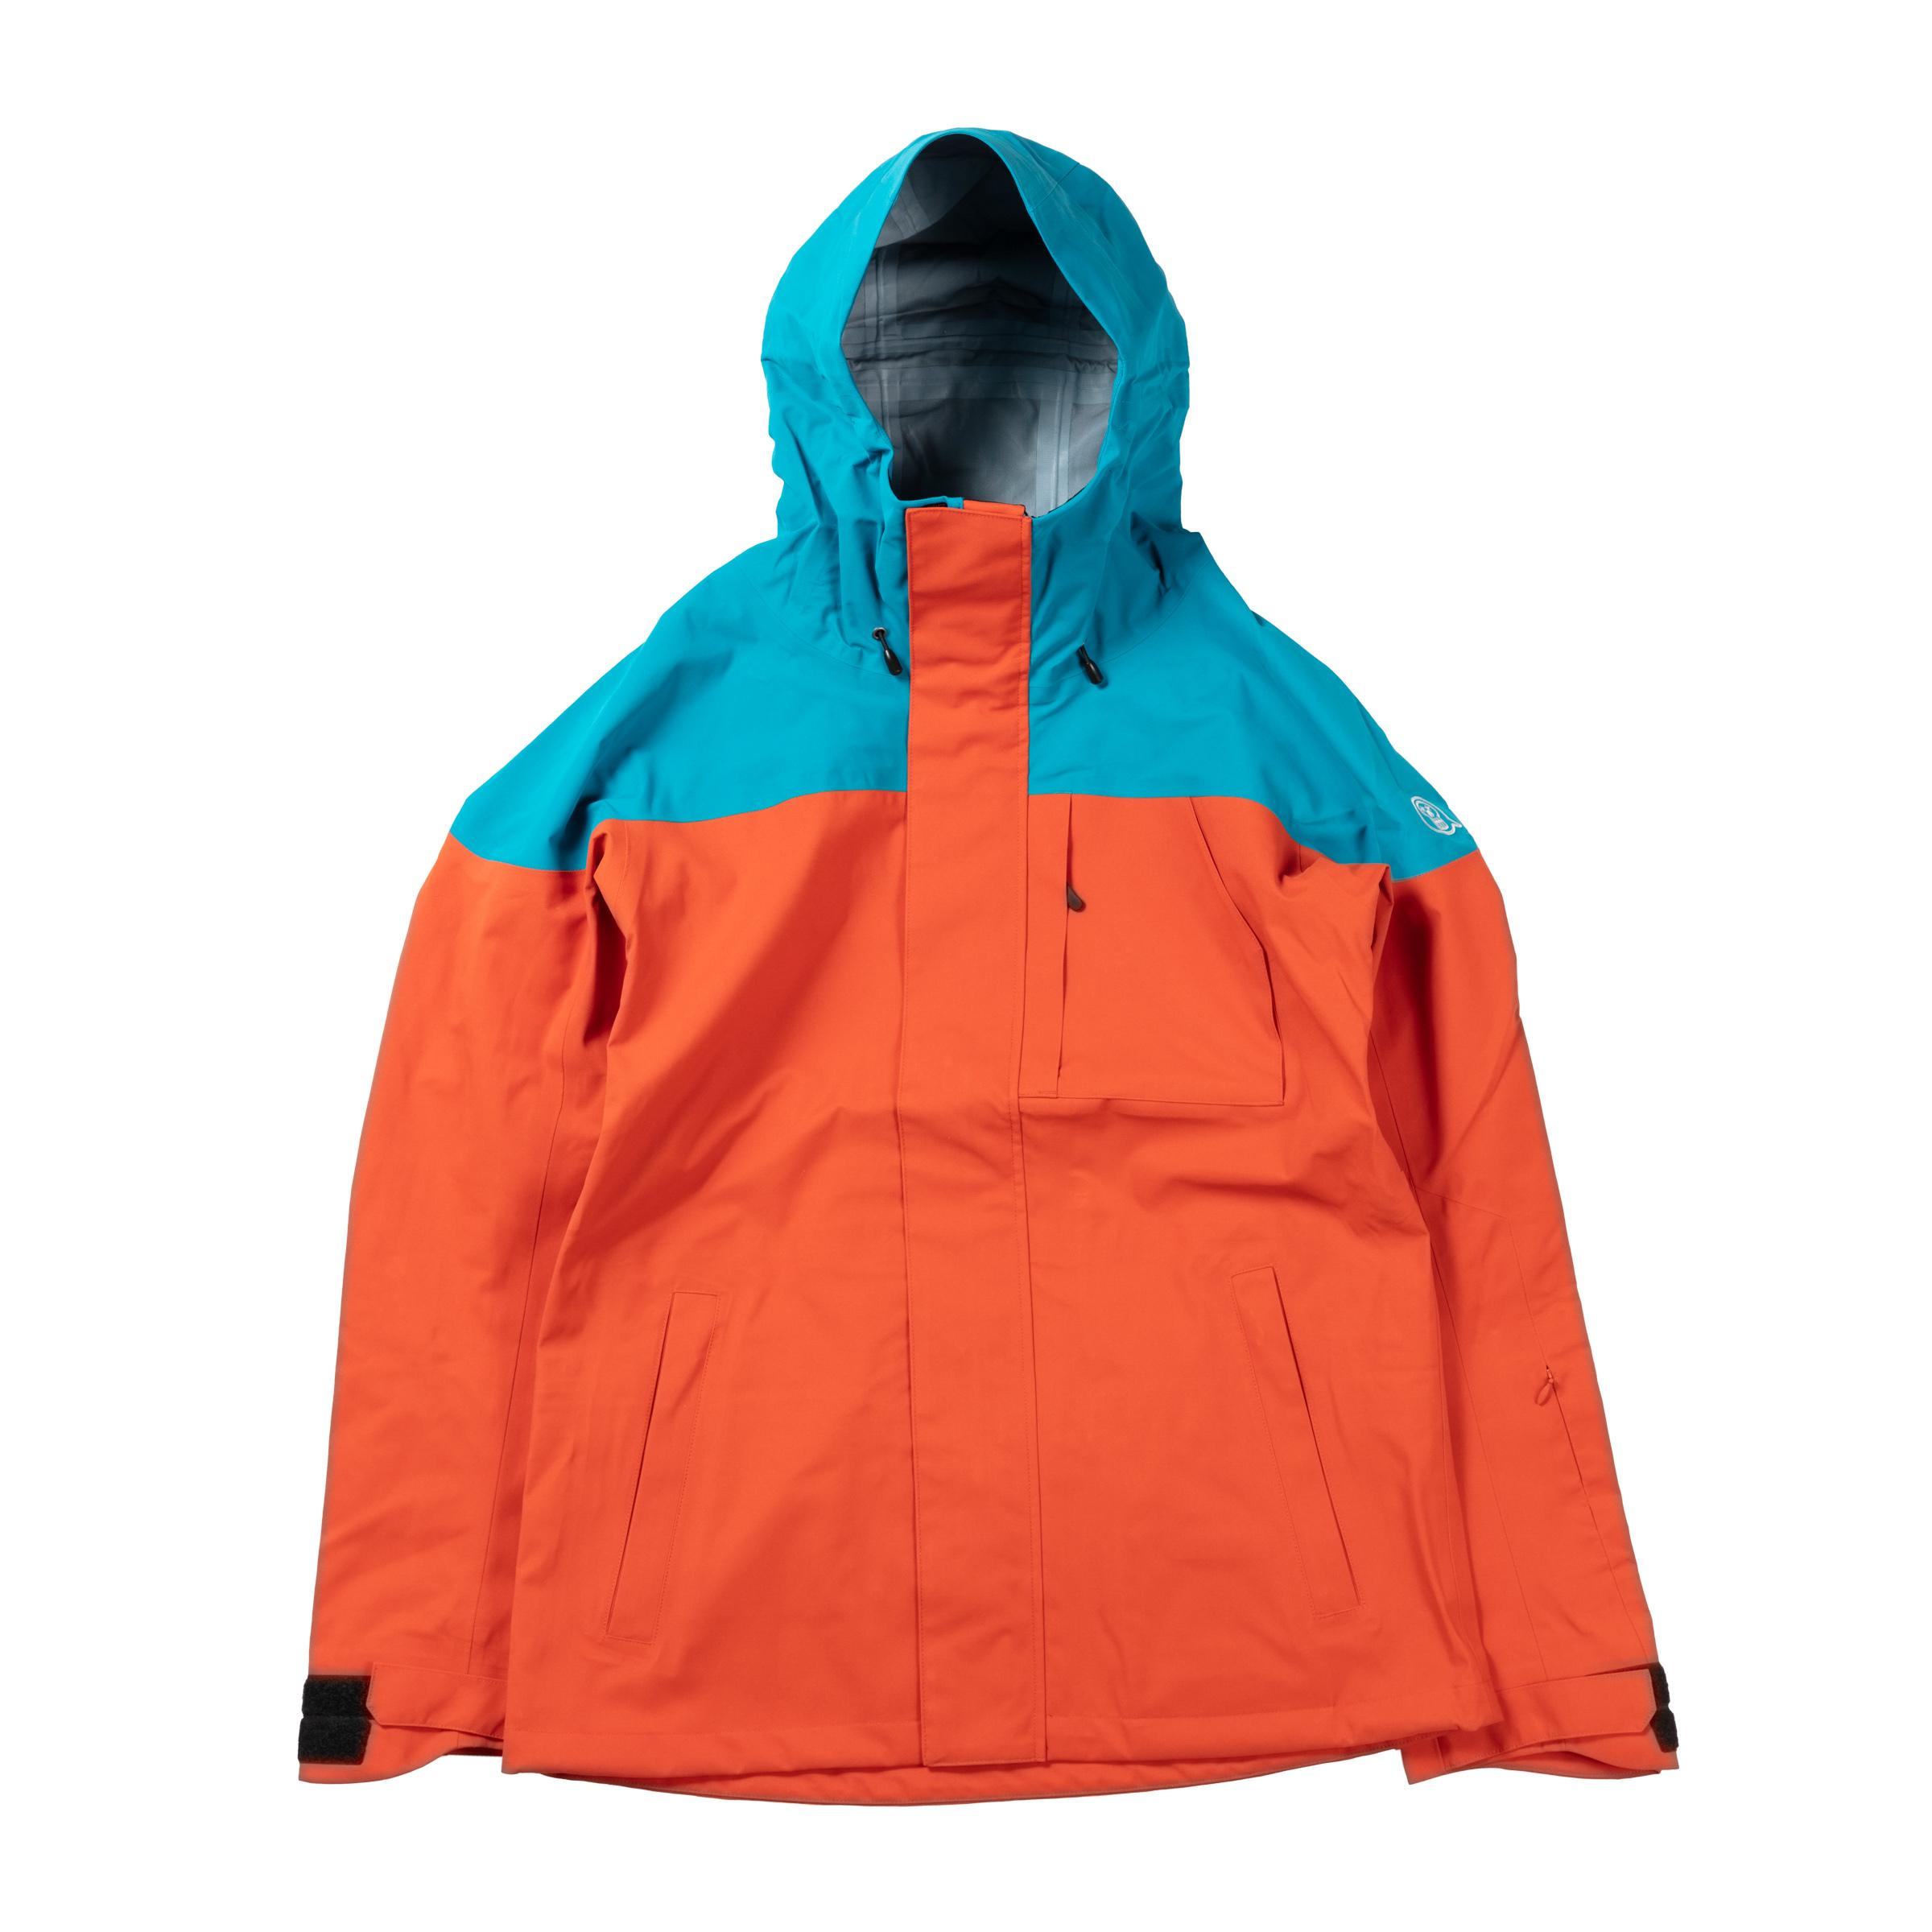 2021unfudge snow wear // PEEP JACKET // ORANGE / 10月中旬発送